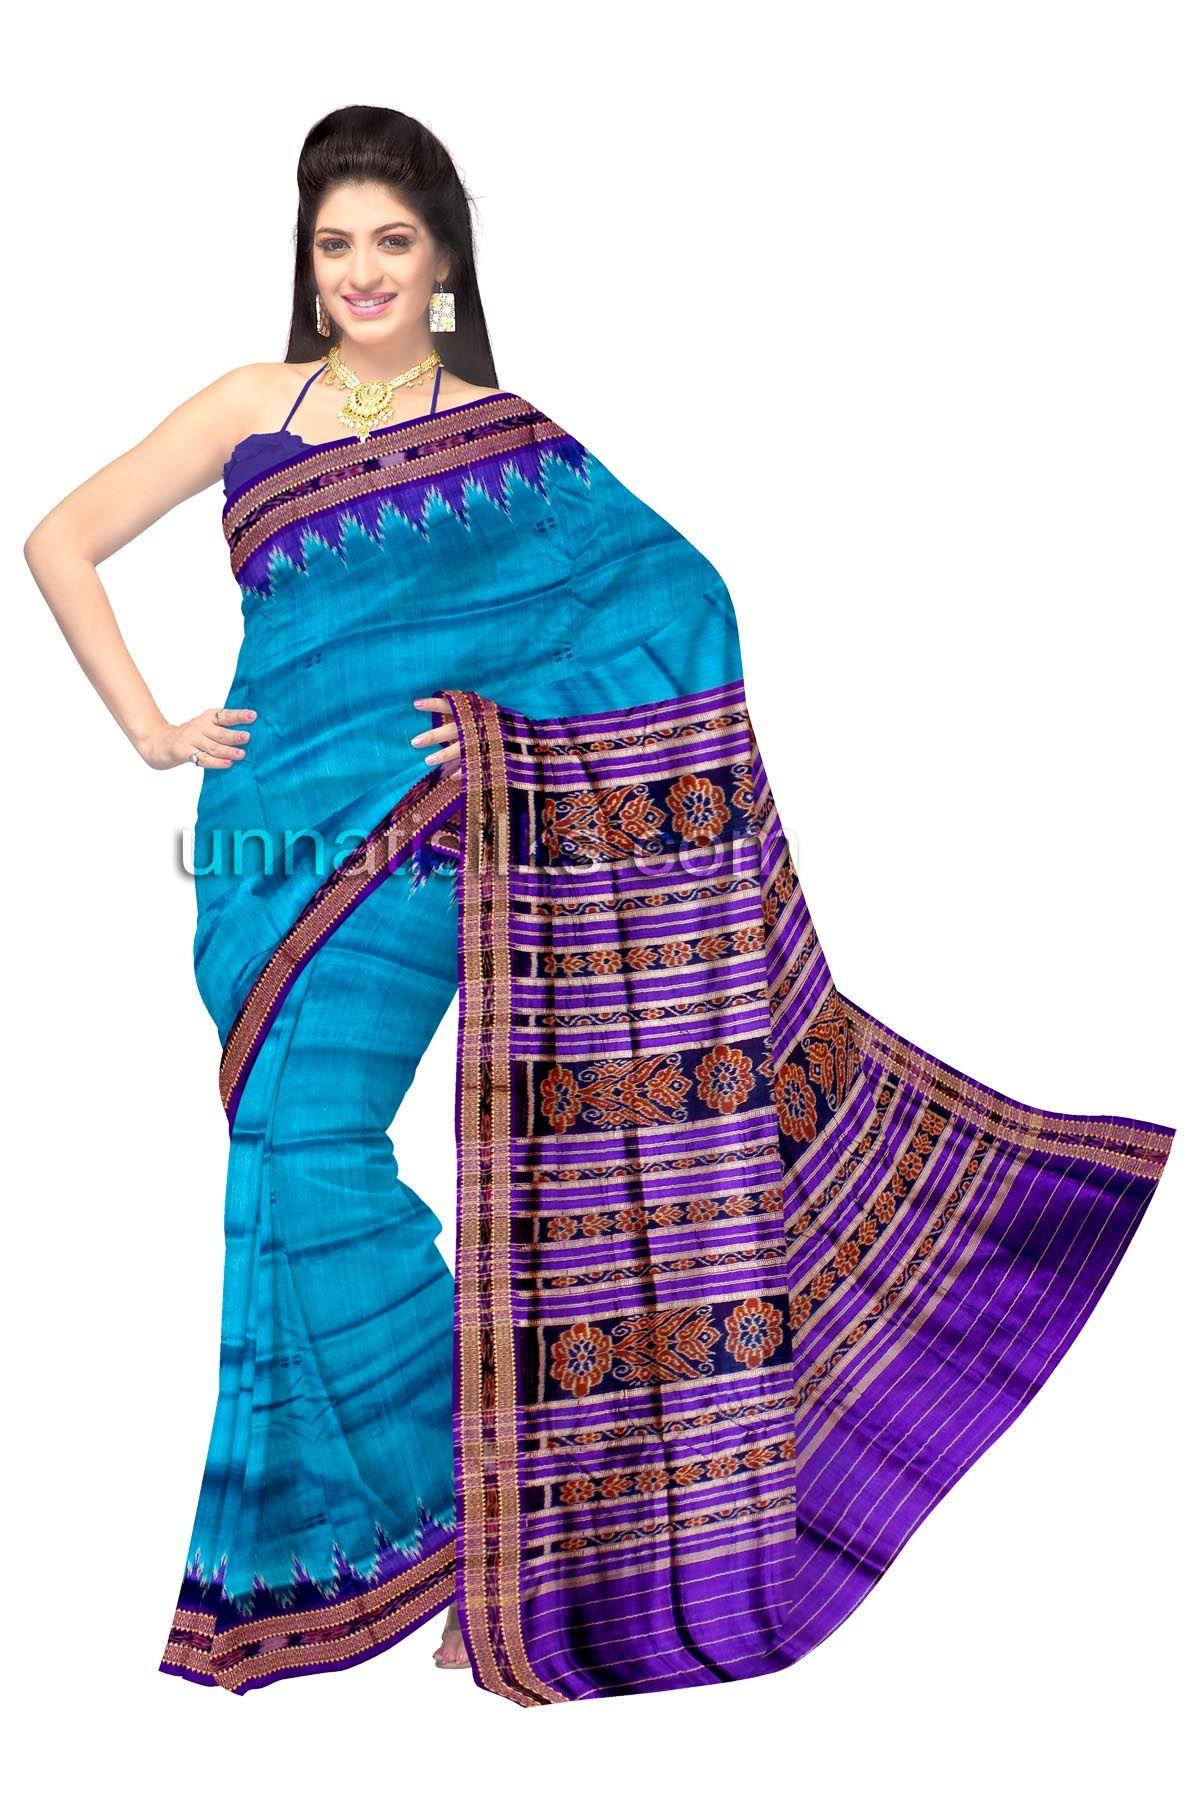 66c86047a0 Online shopping for exclusive Sambalpuri sarees, designer sambhalpuri silk  saris, latest sambalpuri ikkat saree from Unnati silks, Indian ethnic  shopping ...